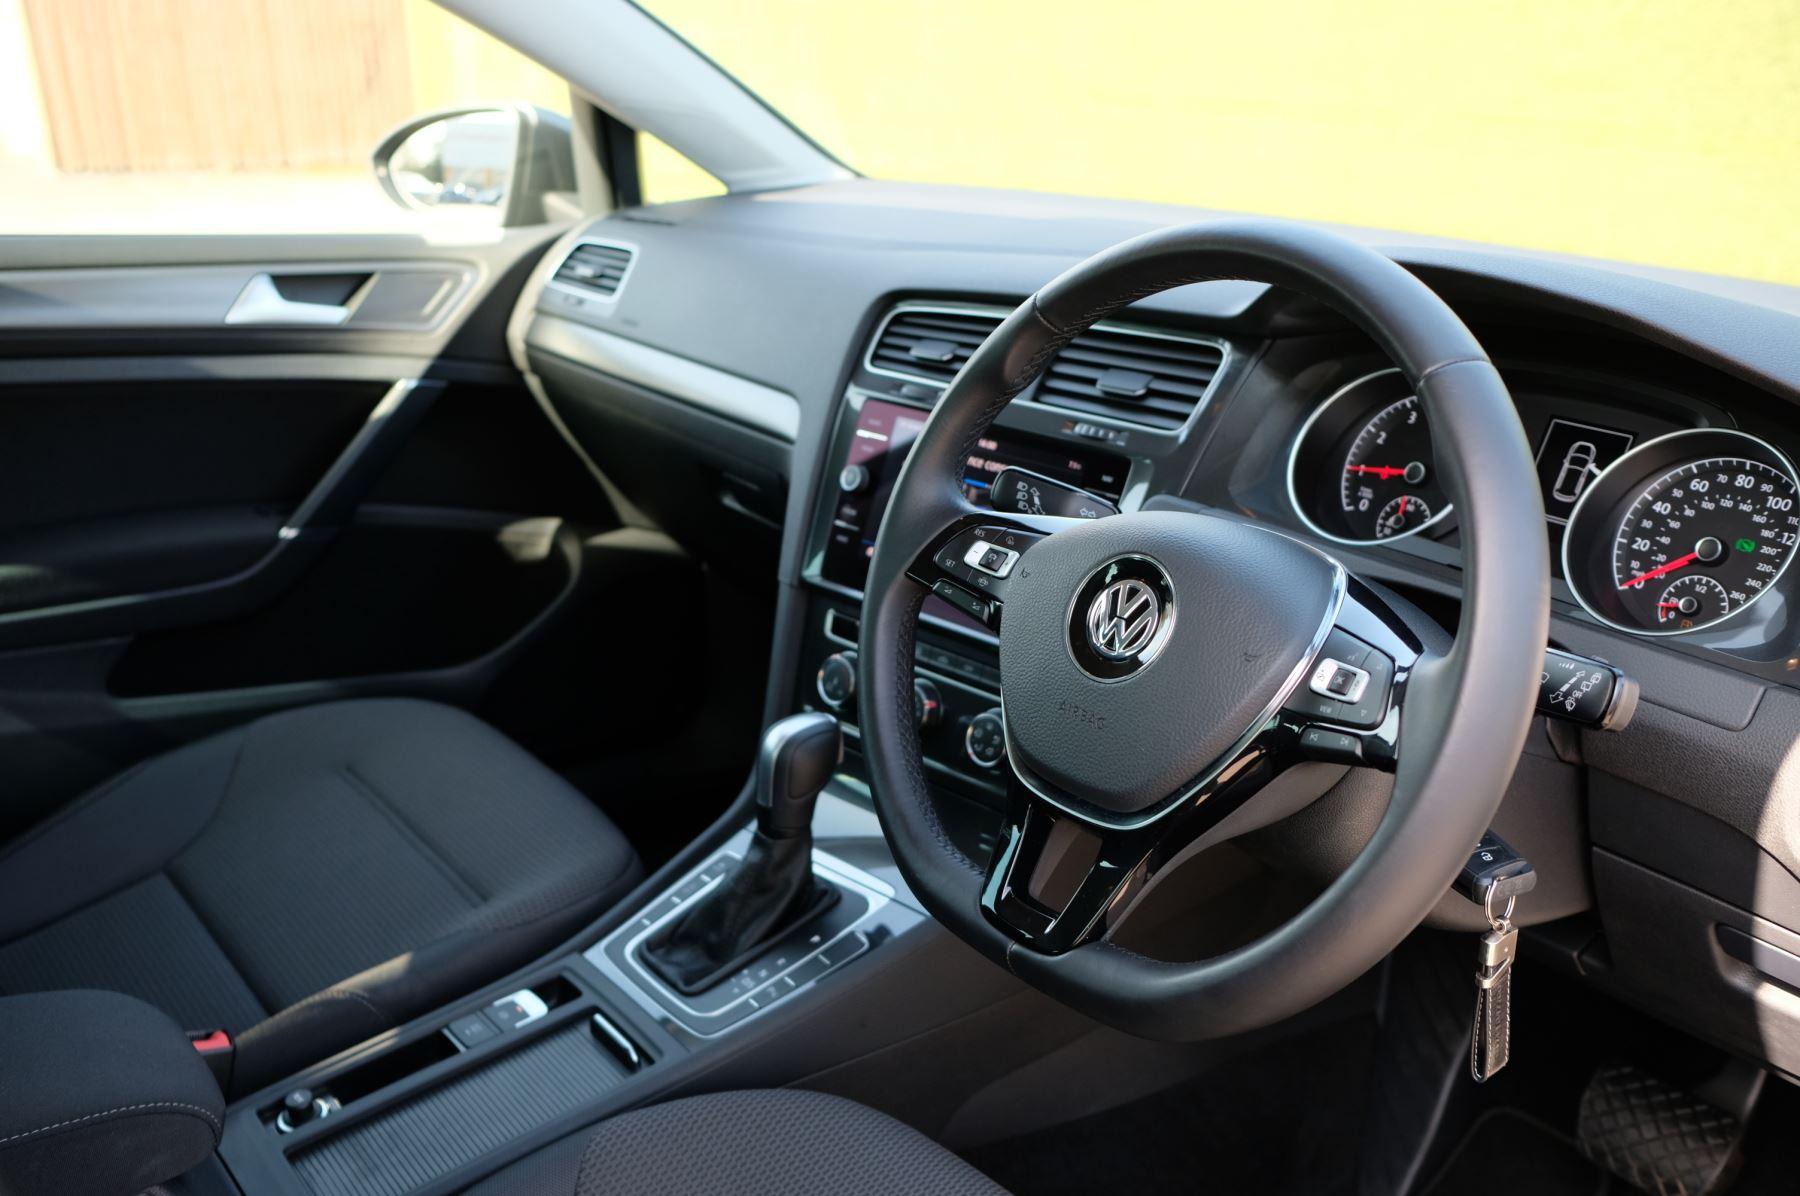 Volkswagen Golf 1.5 TSI EVO 150hp Match 5 Door DSG Auto with A/Con, Sat Nav, Alloys & Adaptive Cruise  image 10